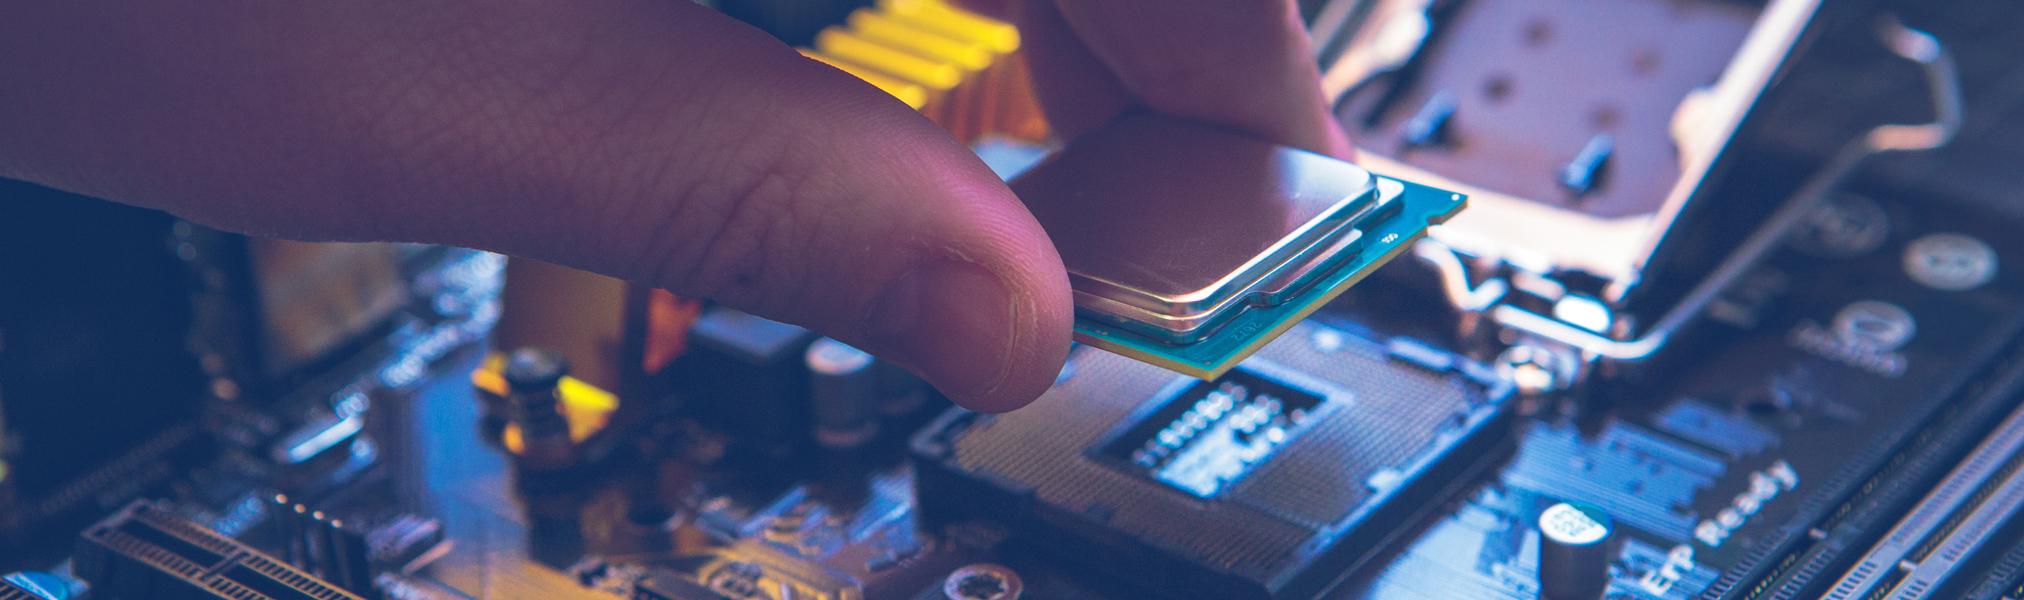 techie-data-card-2024-0919